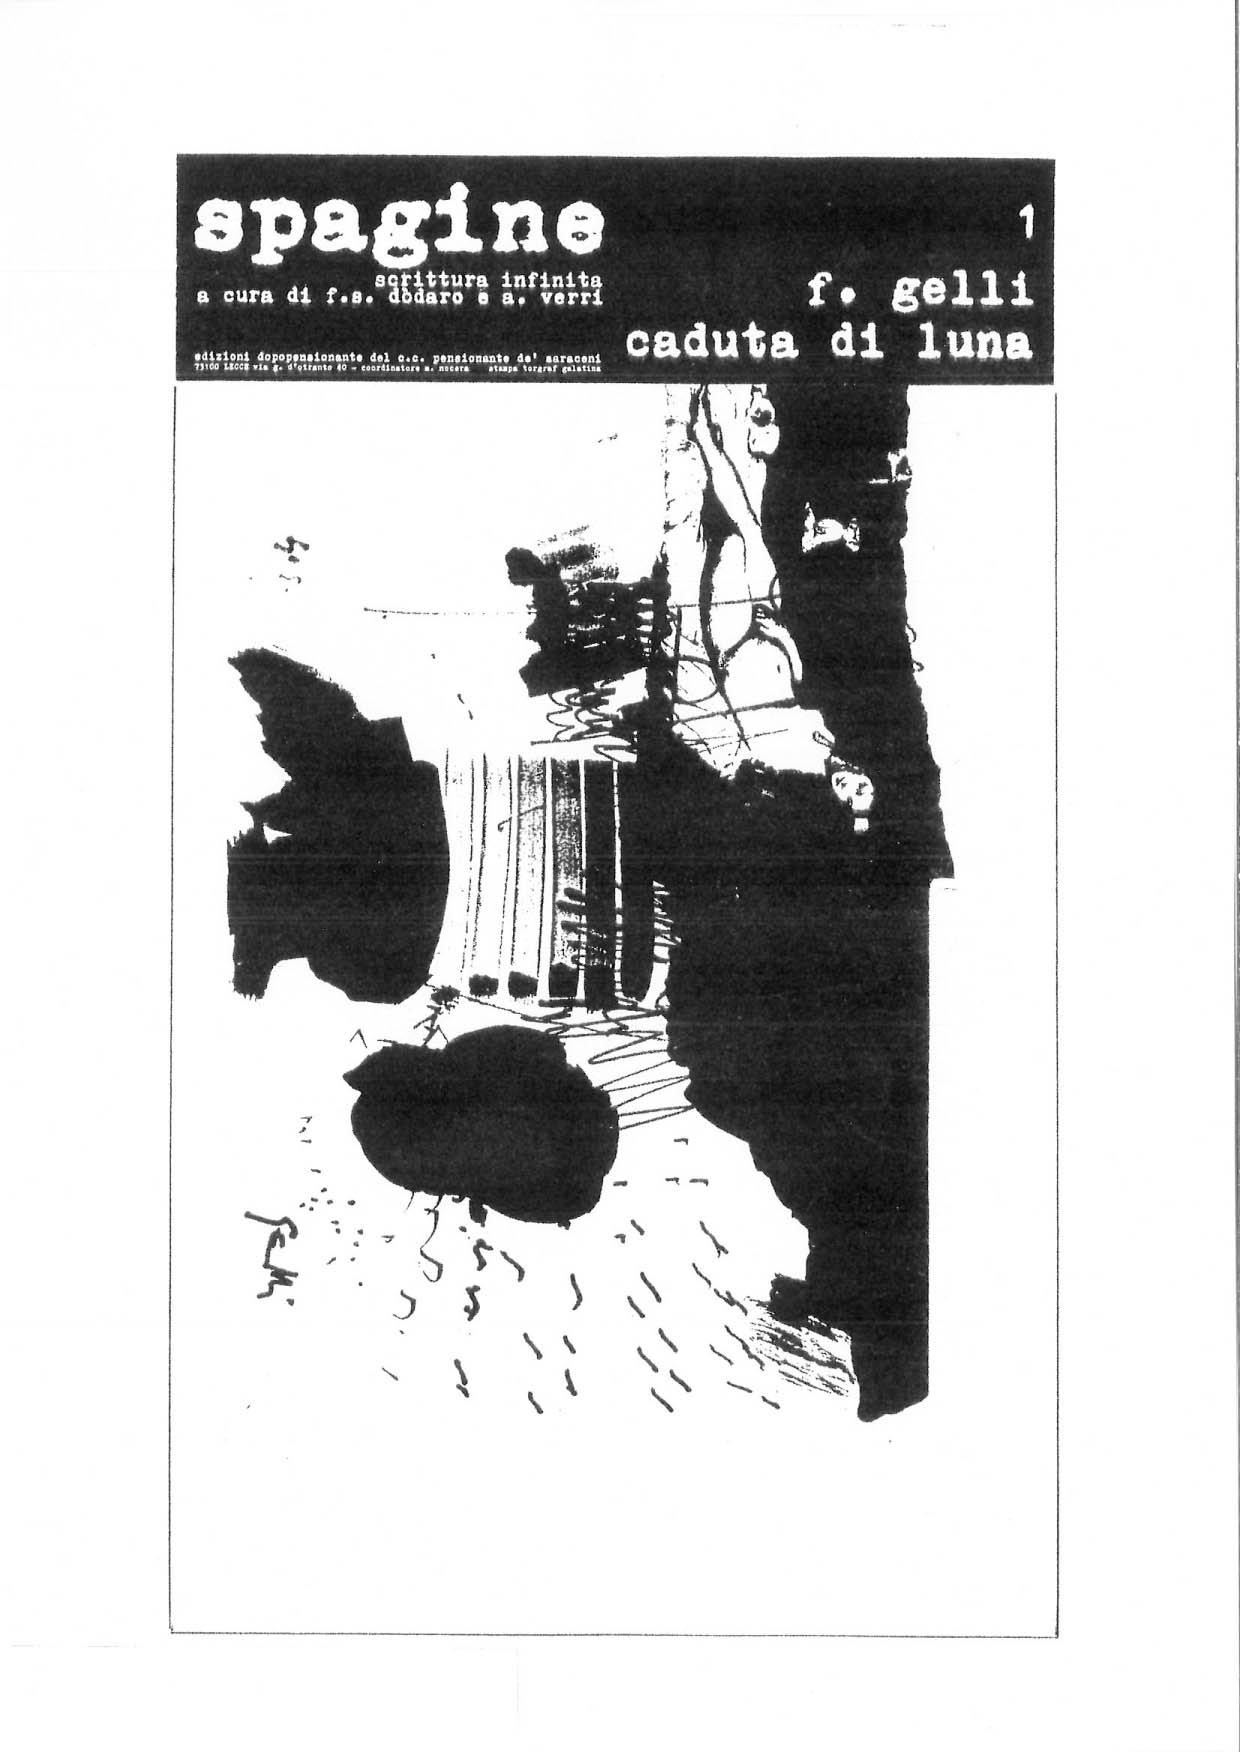 spagine 1989 (04)